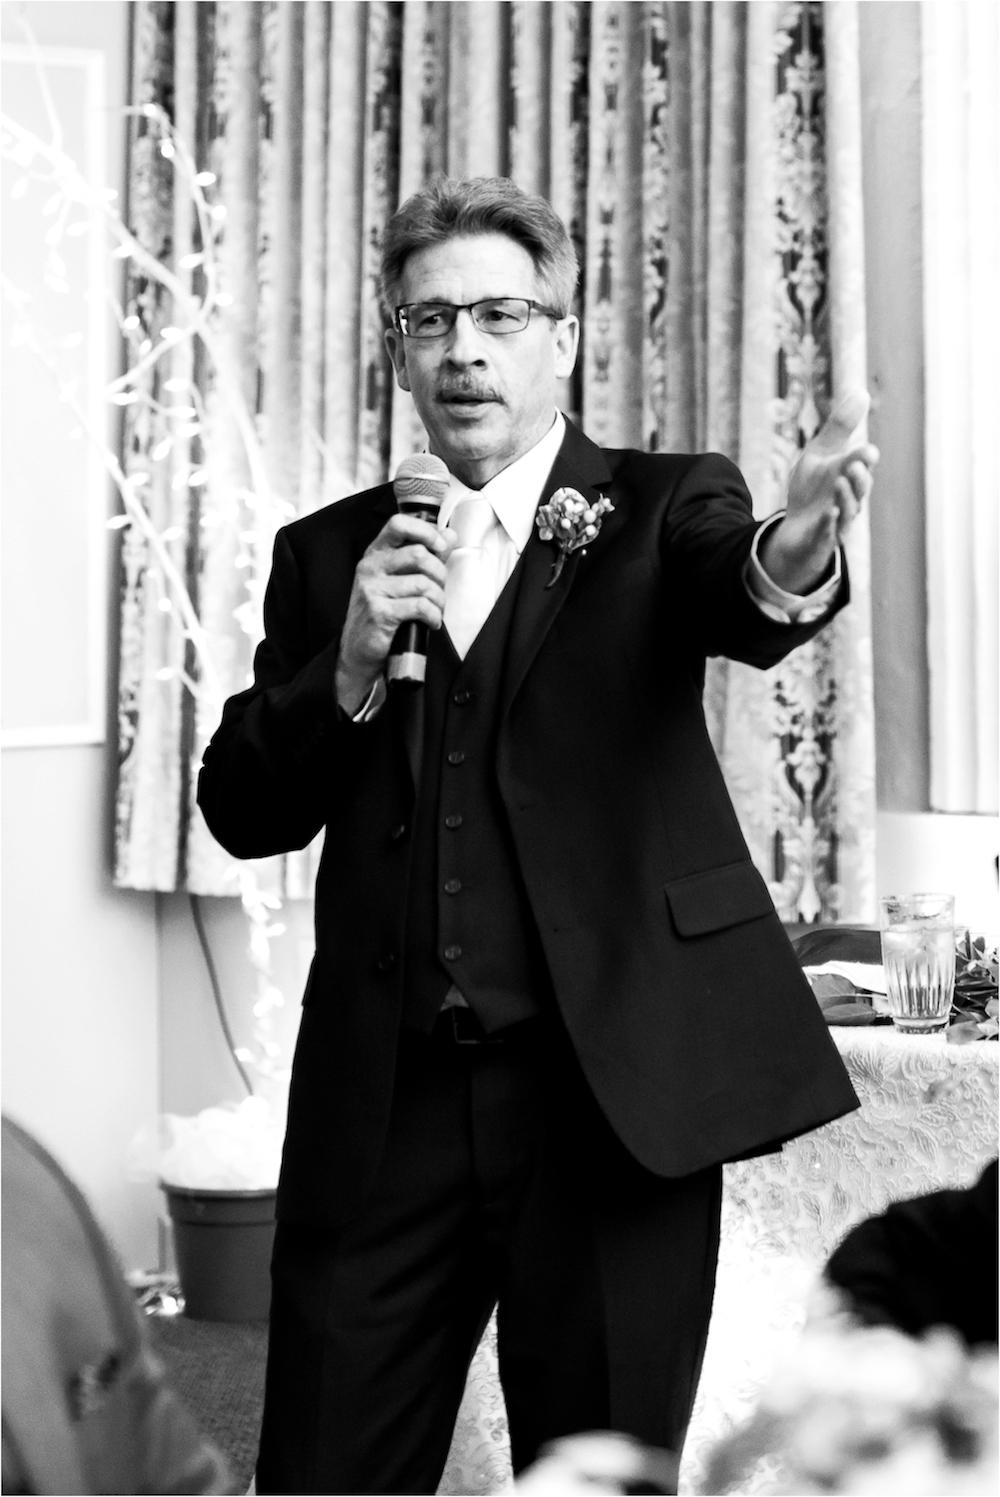 meeting-house-grand-ballroom-plymouth-michigan-wedding-photo-203.jpg